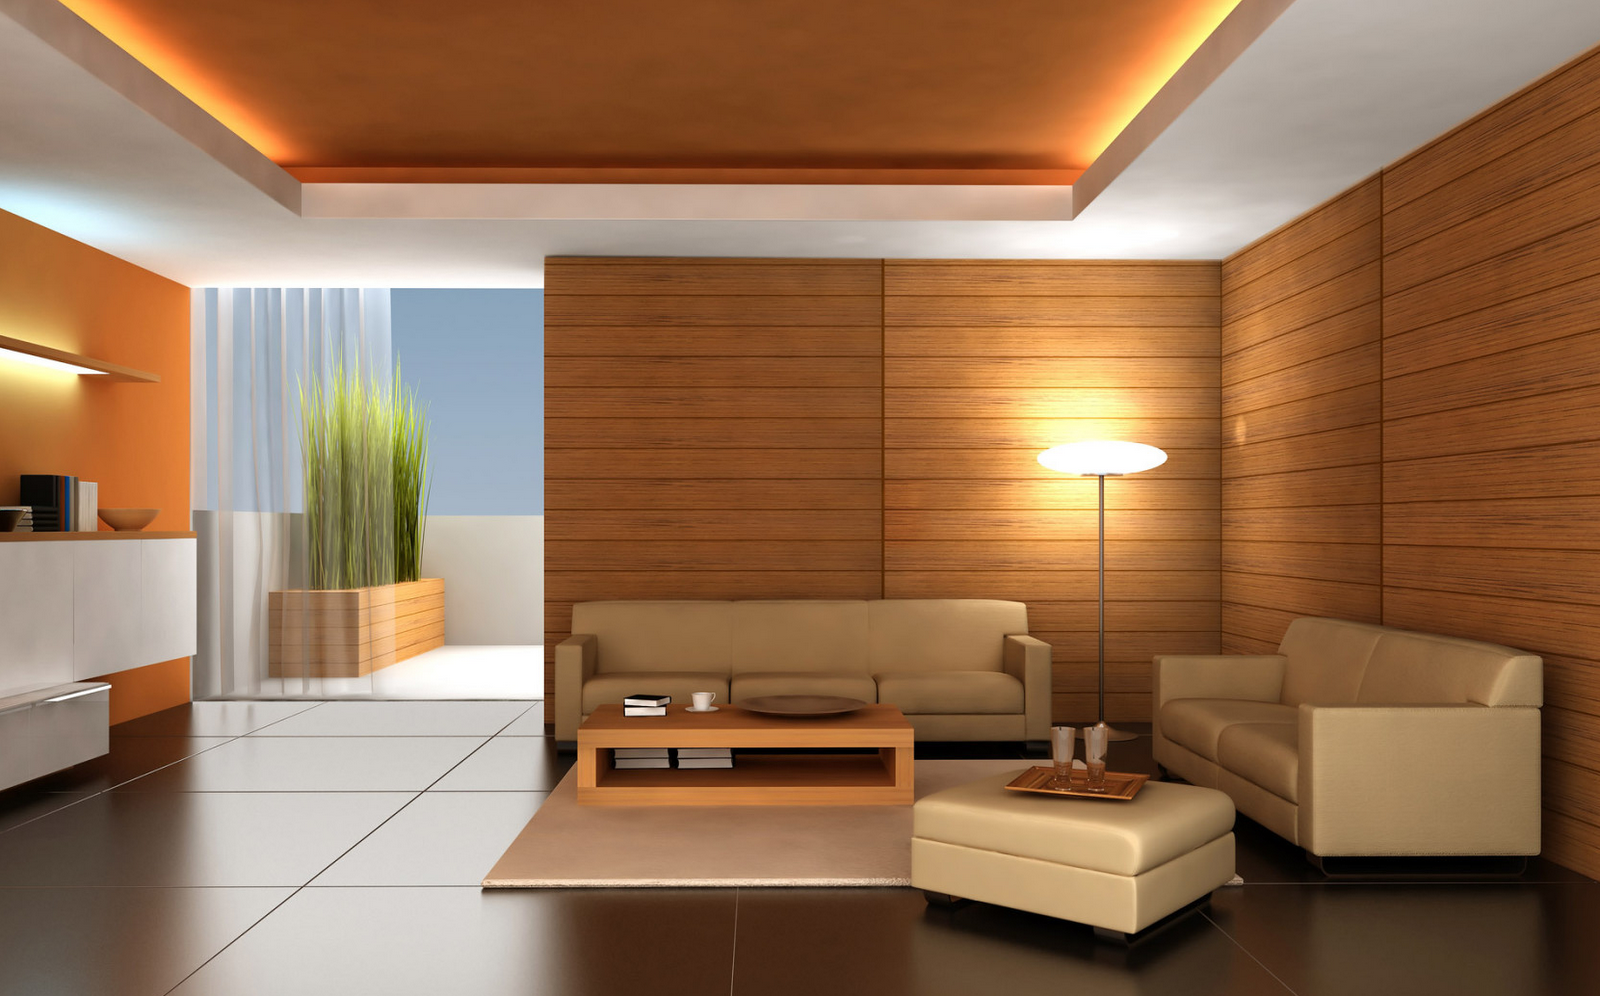 Http2Bpblogspot4Xbx1Rbli78Tz9Fw43Nu4Iaaaaaaaablu Brilliant Wooden Ceiling Designs For Living Room Design Ideas